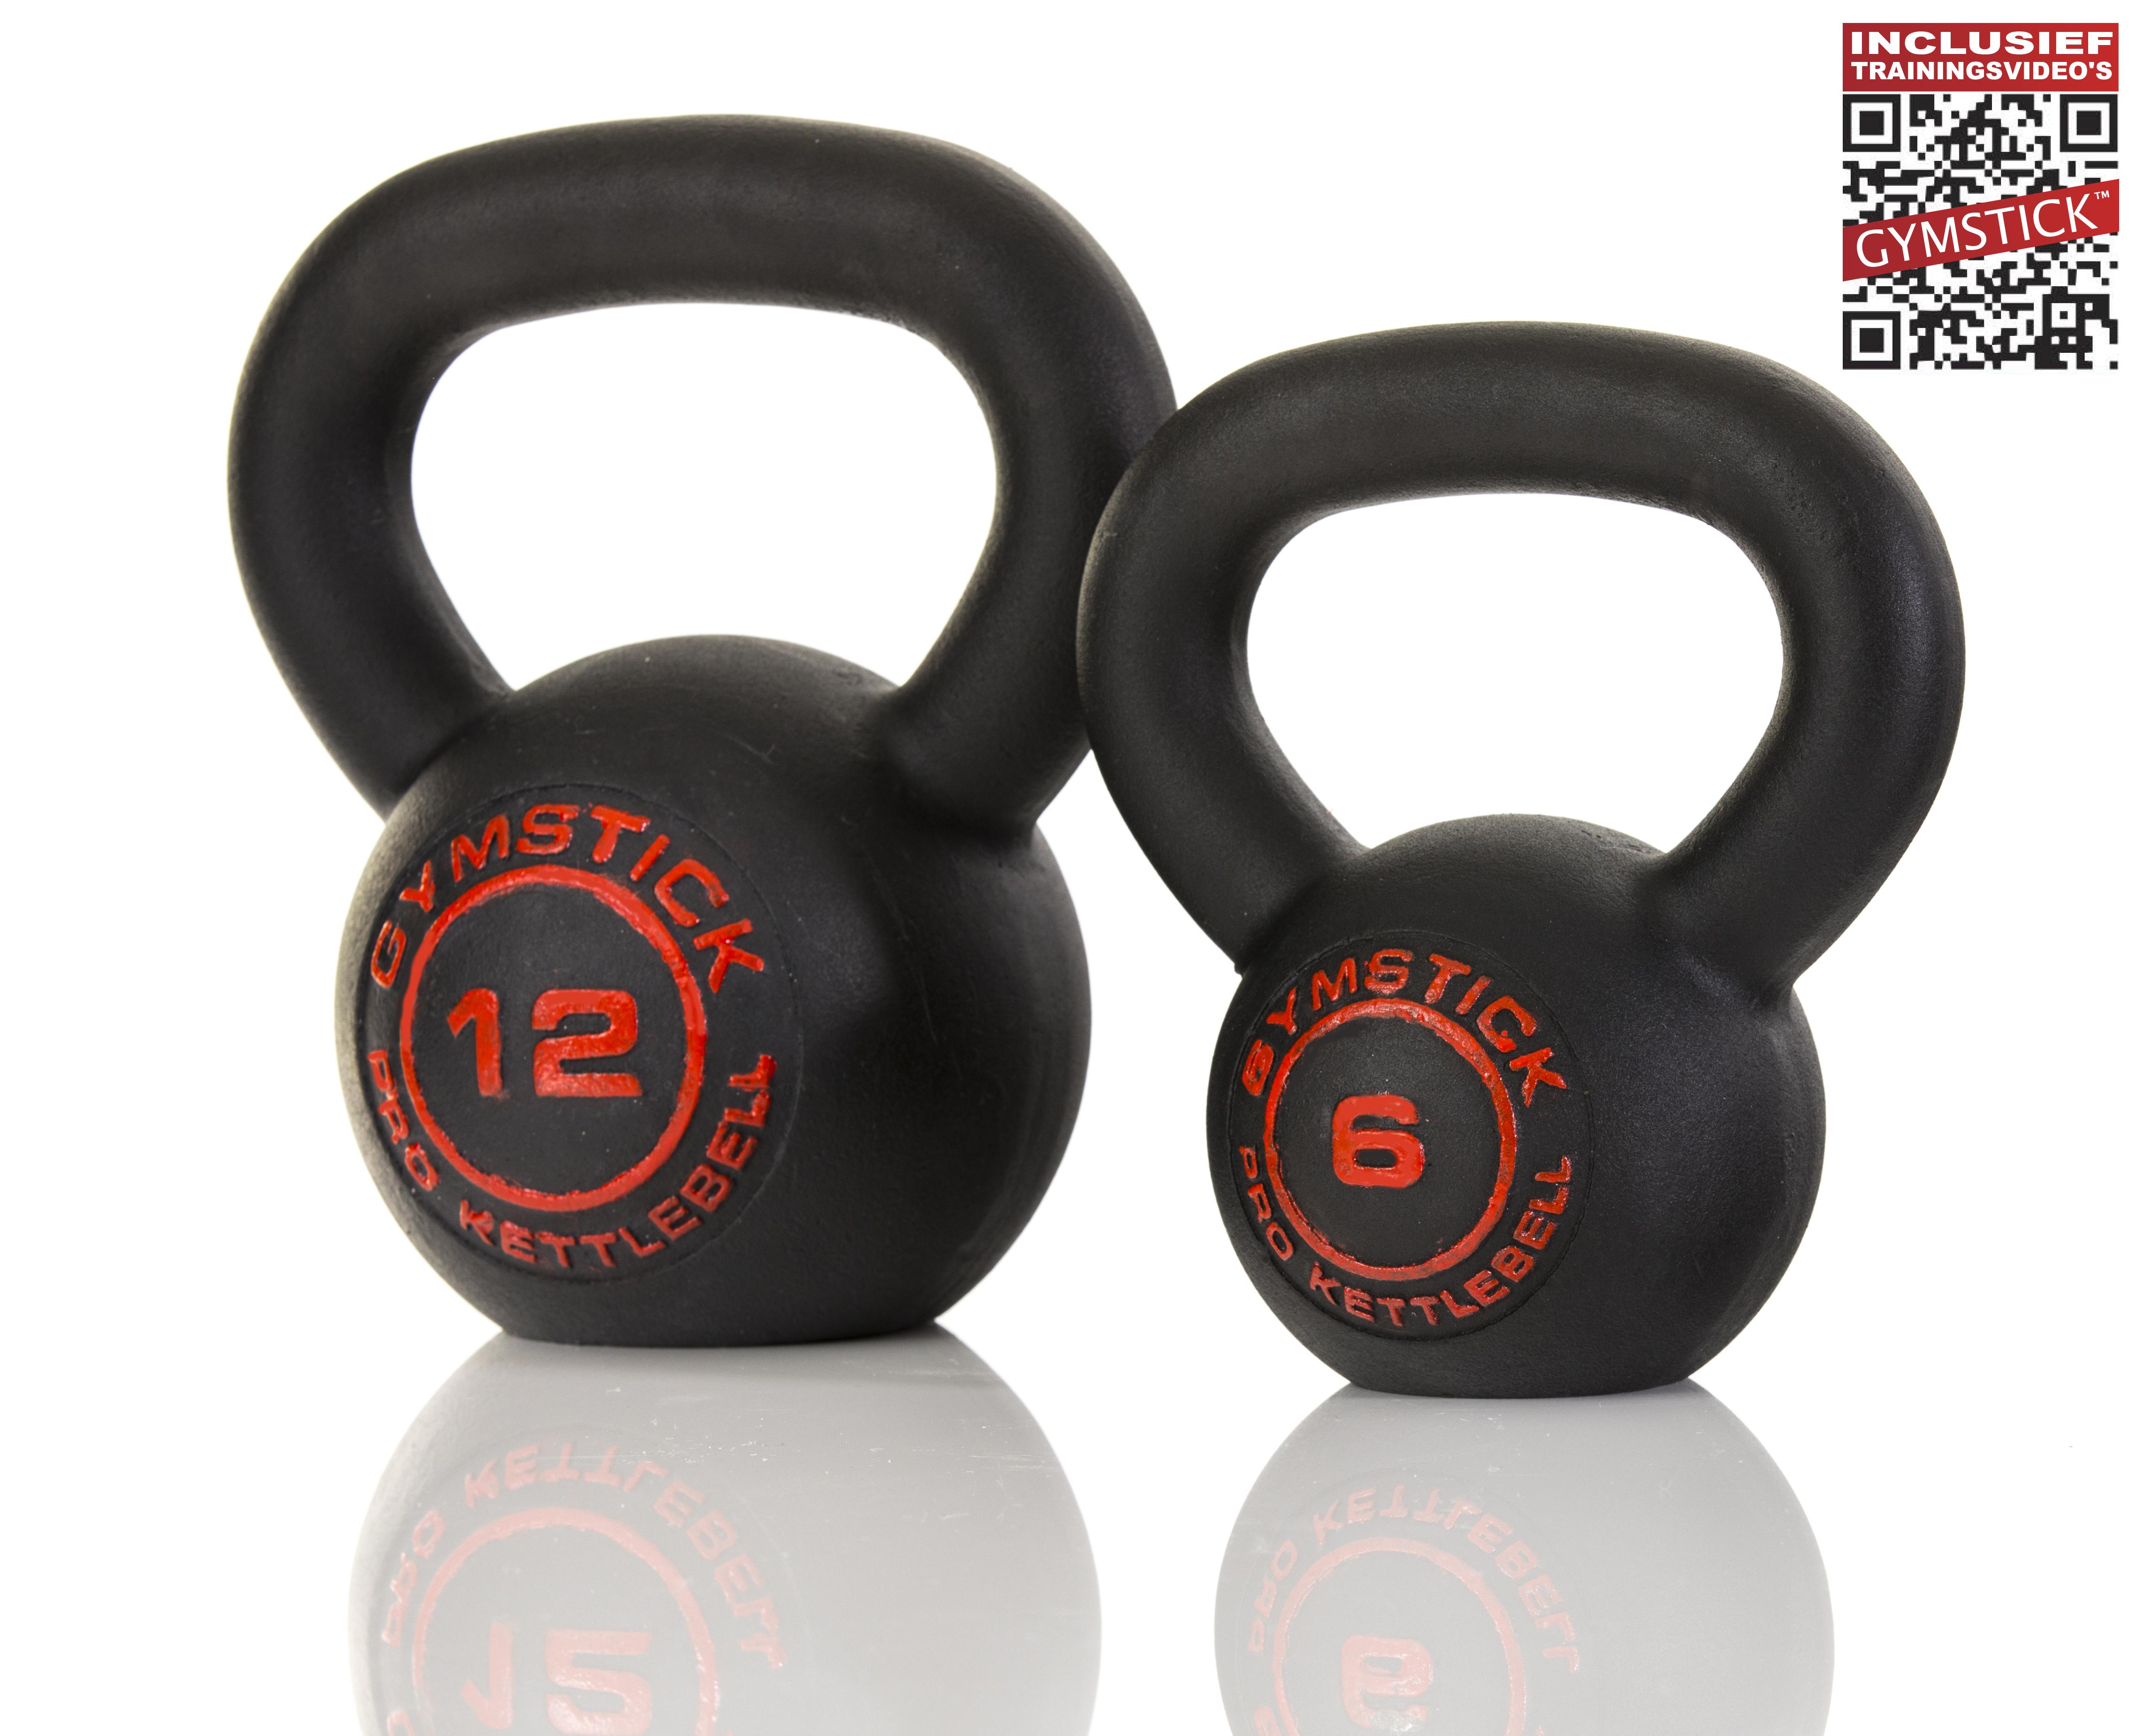 Gymstick Pro Neopreen Kettlebell - Met Online Trainingsvideo's - Zwart - 24 kg